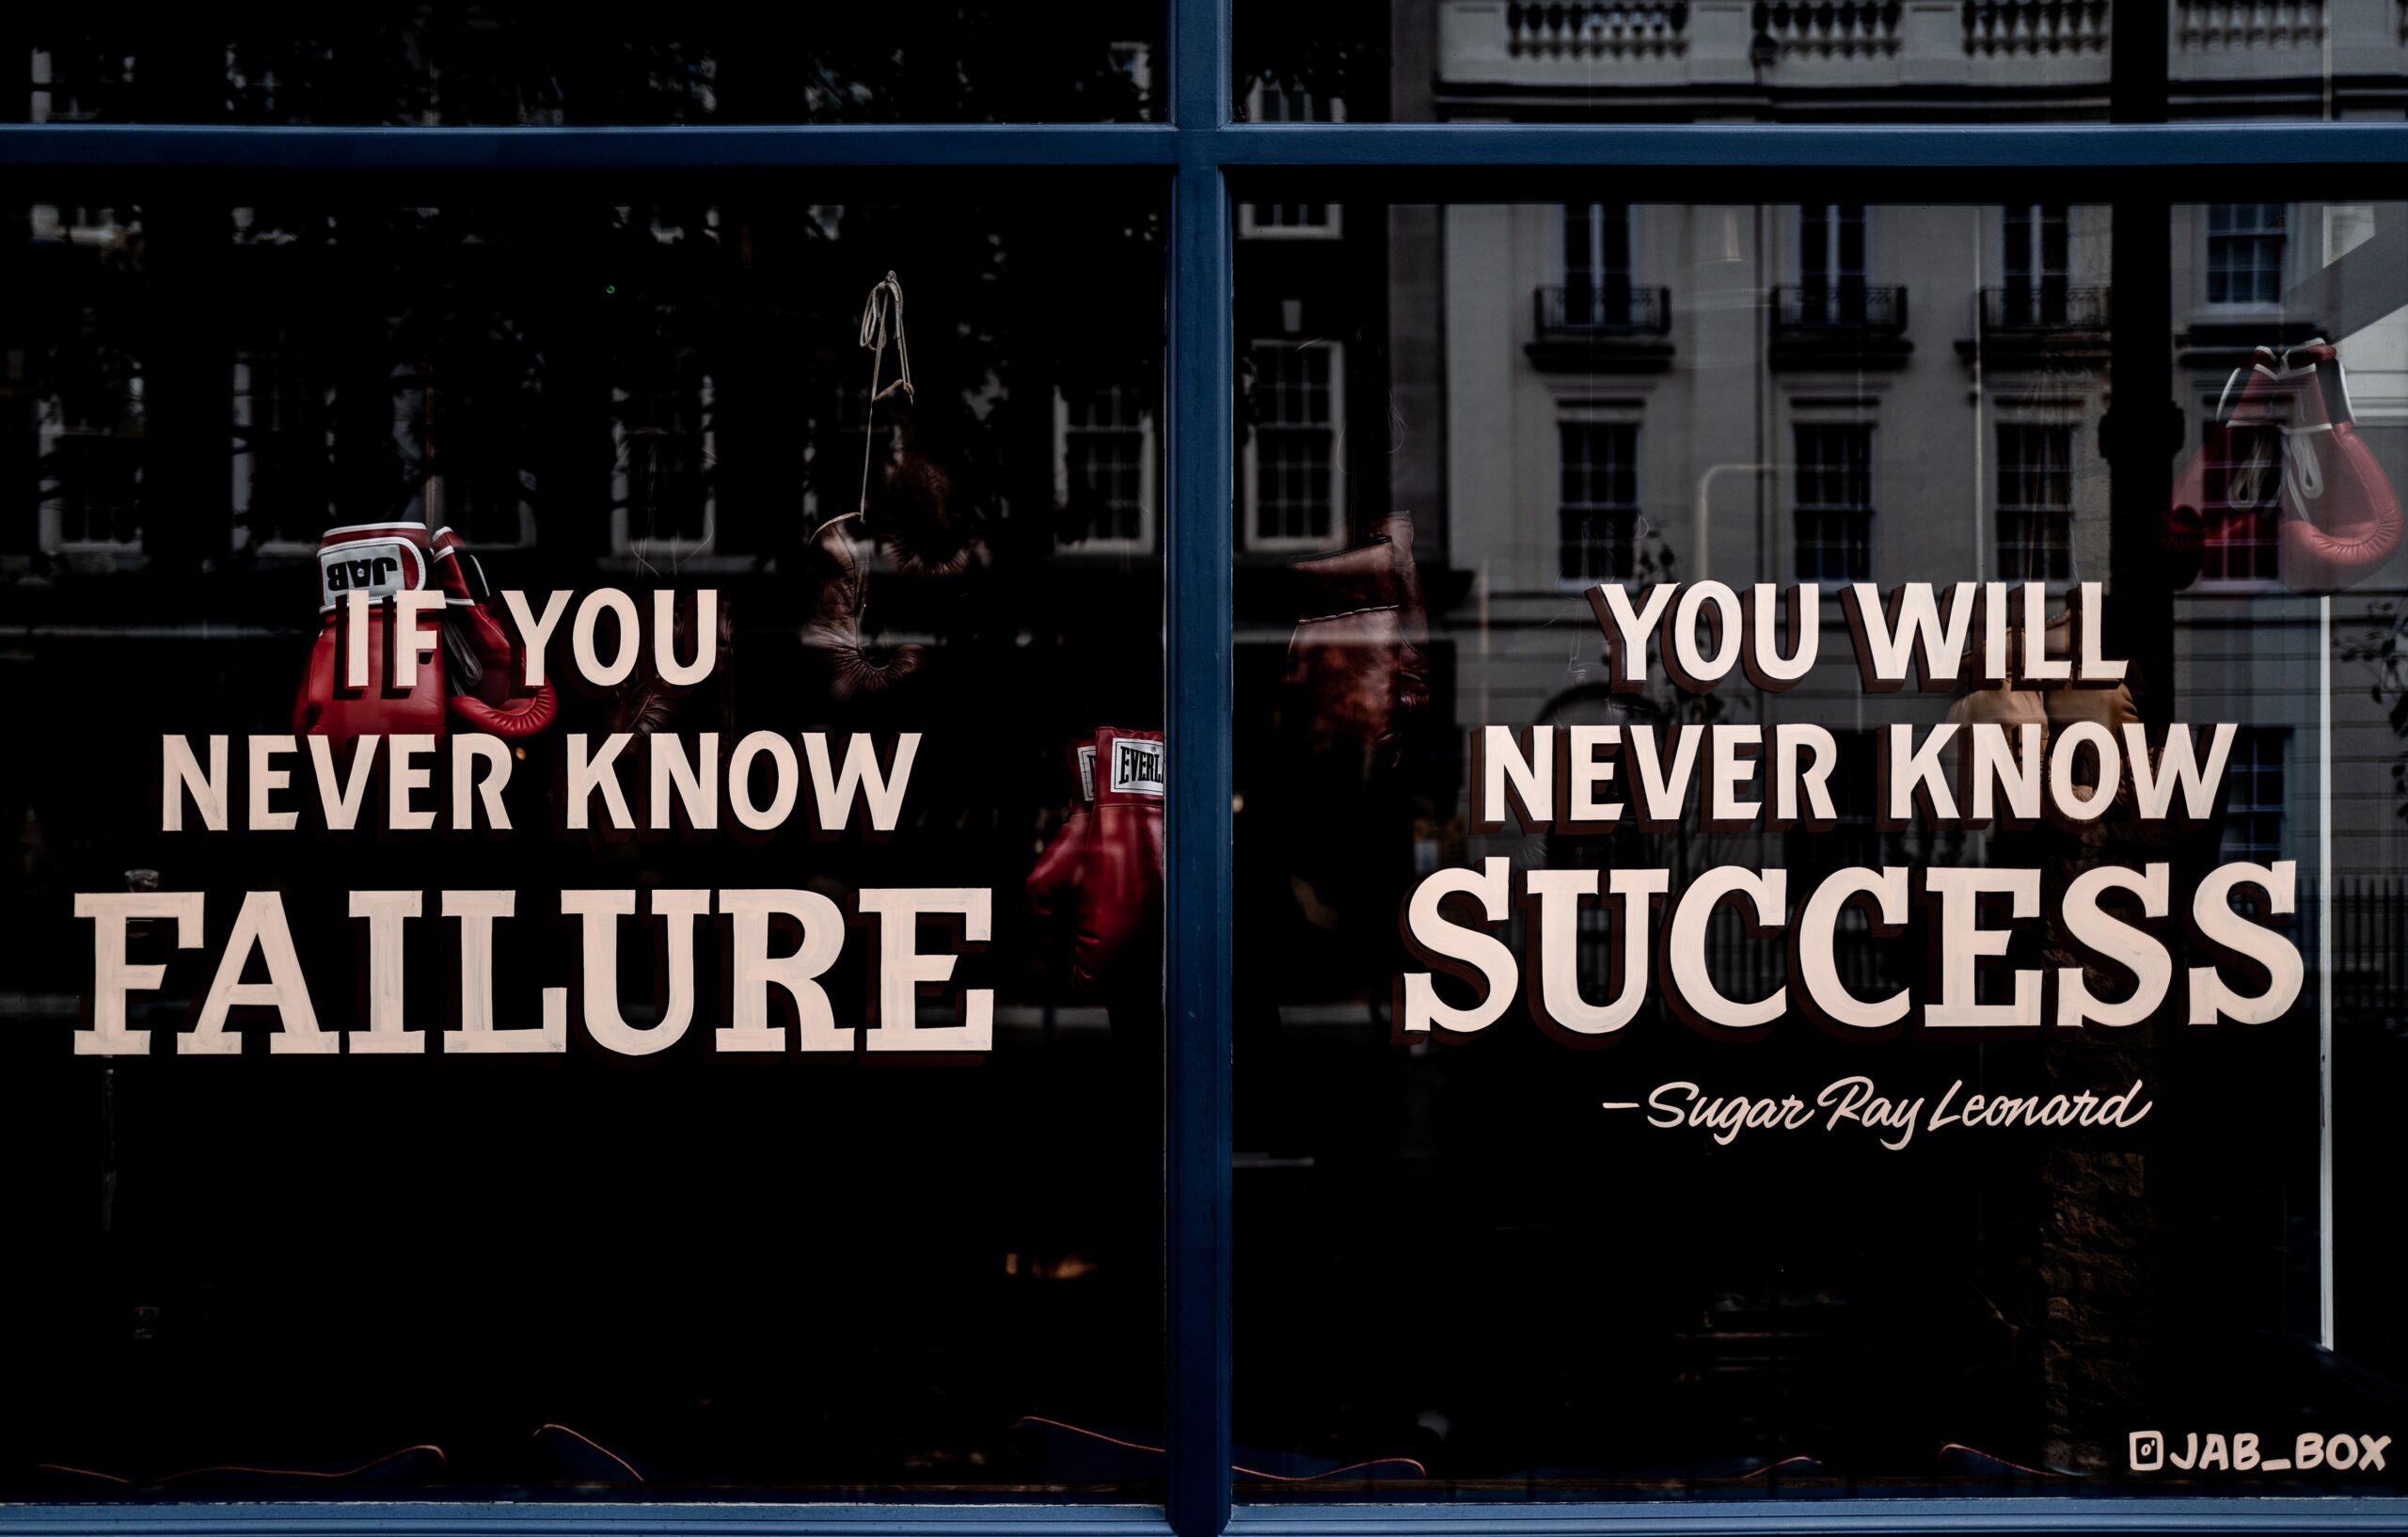 Embrace failure to succeed